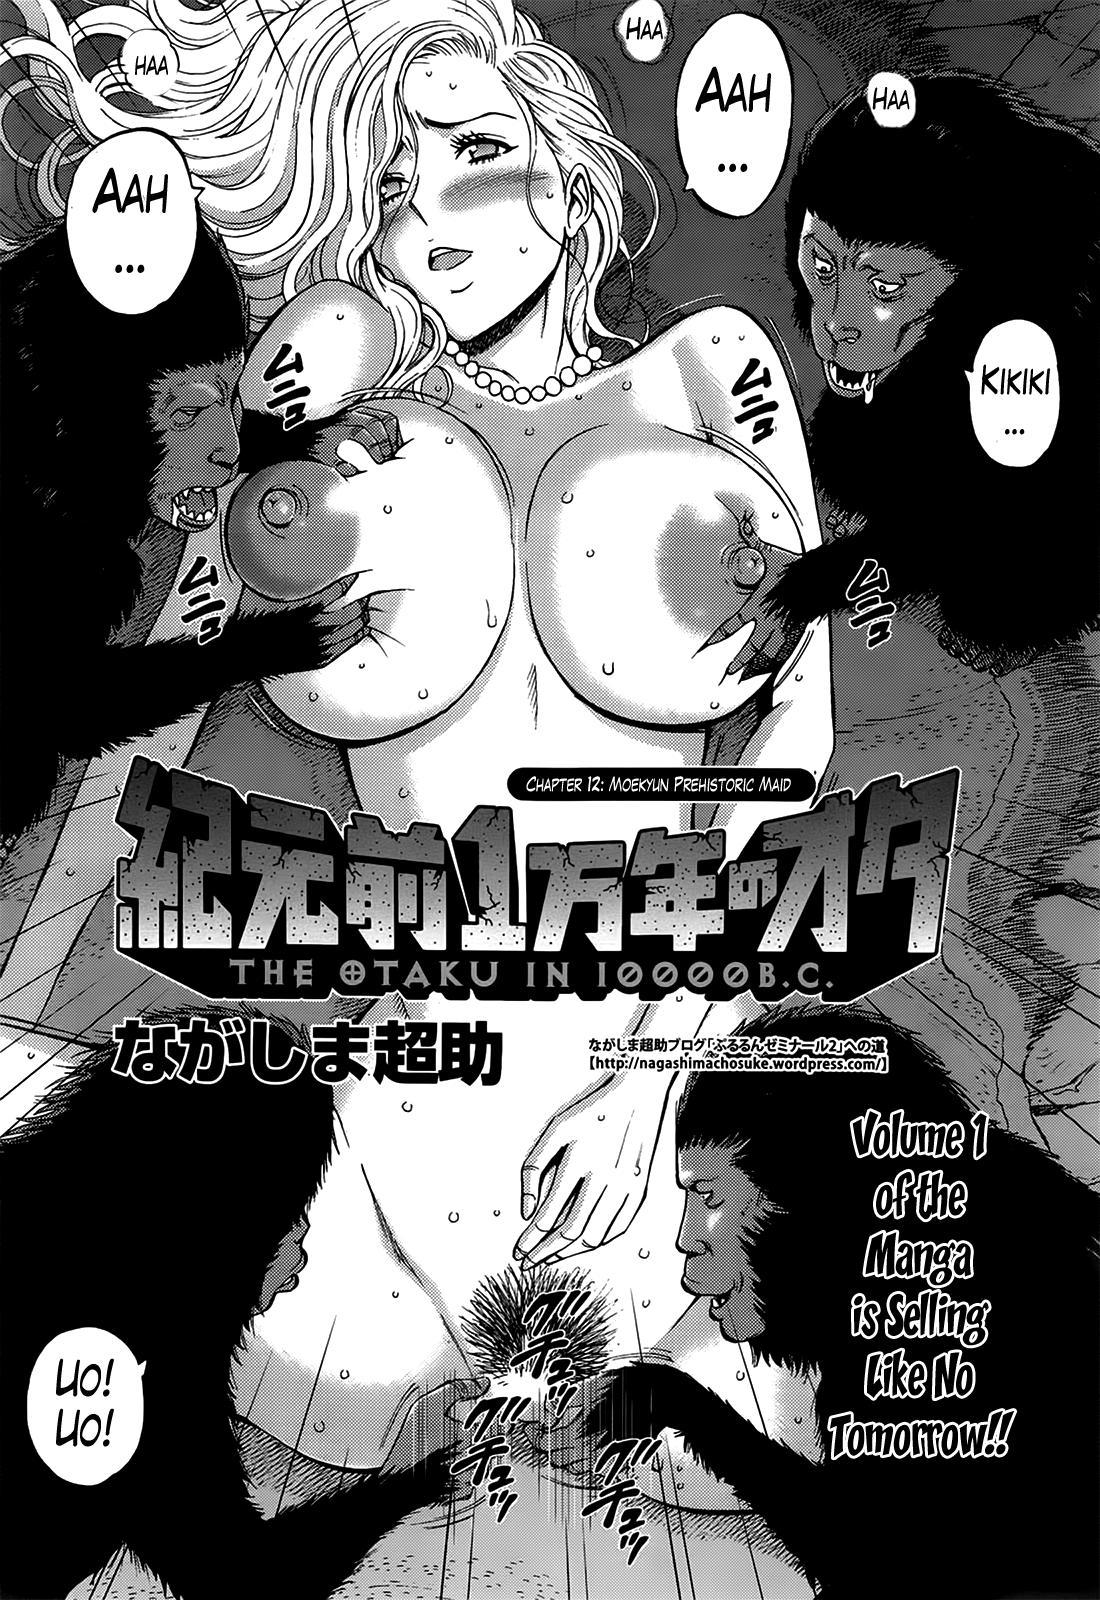 Kigenzen 10000 Nen no Ota | The Otaku in 10,000 B.C. 216